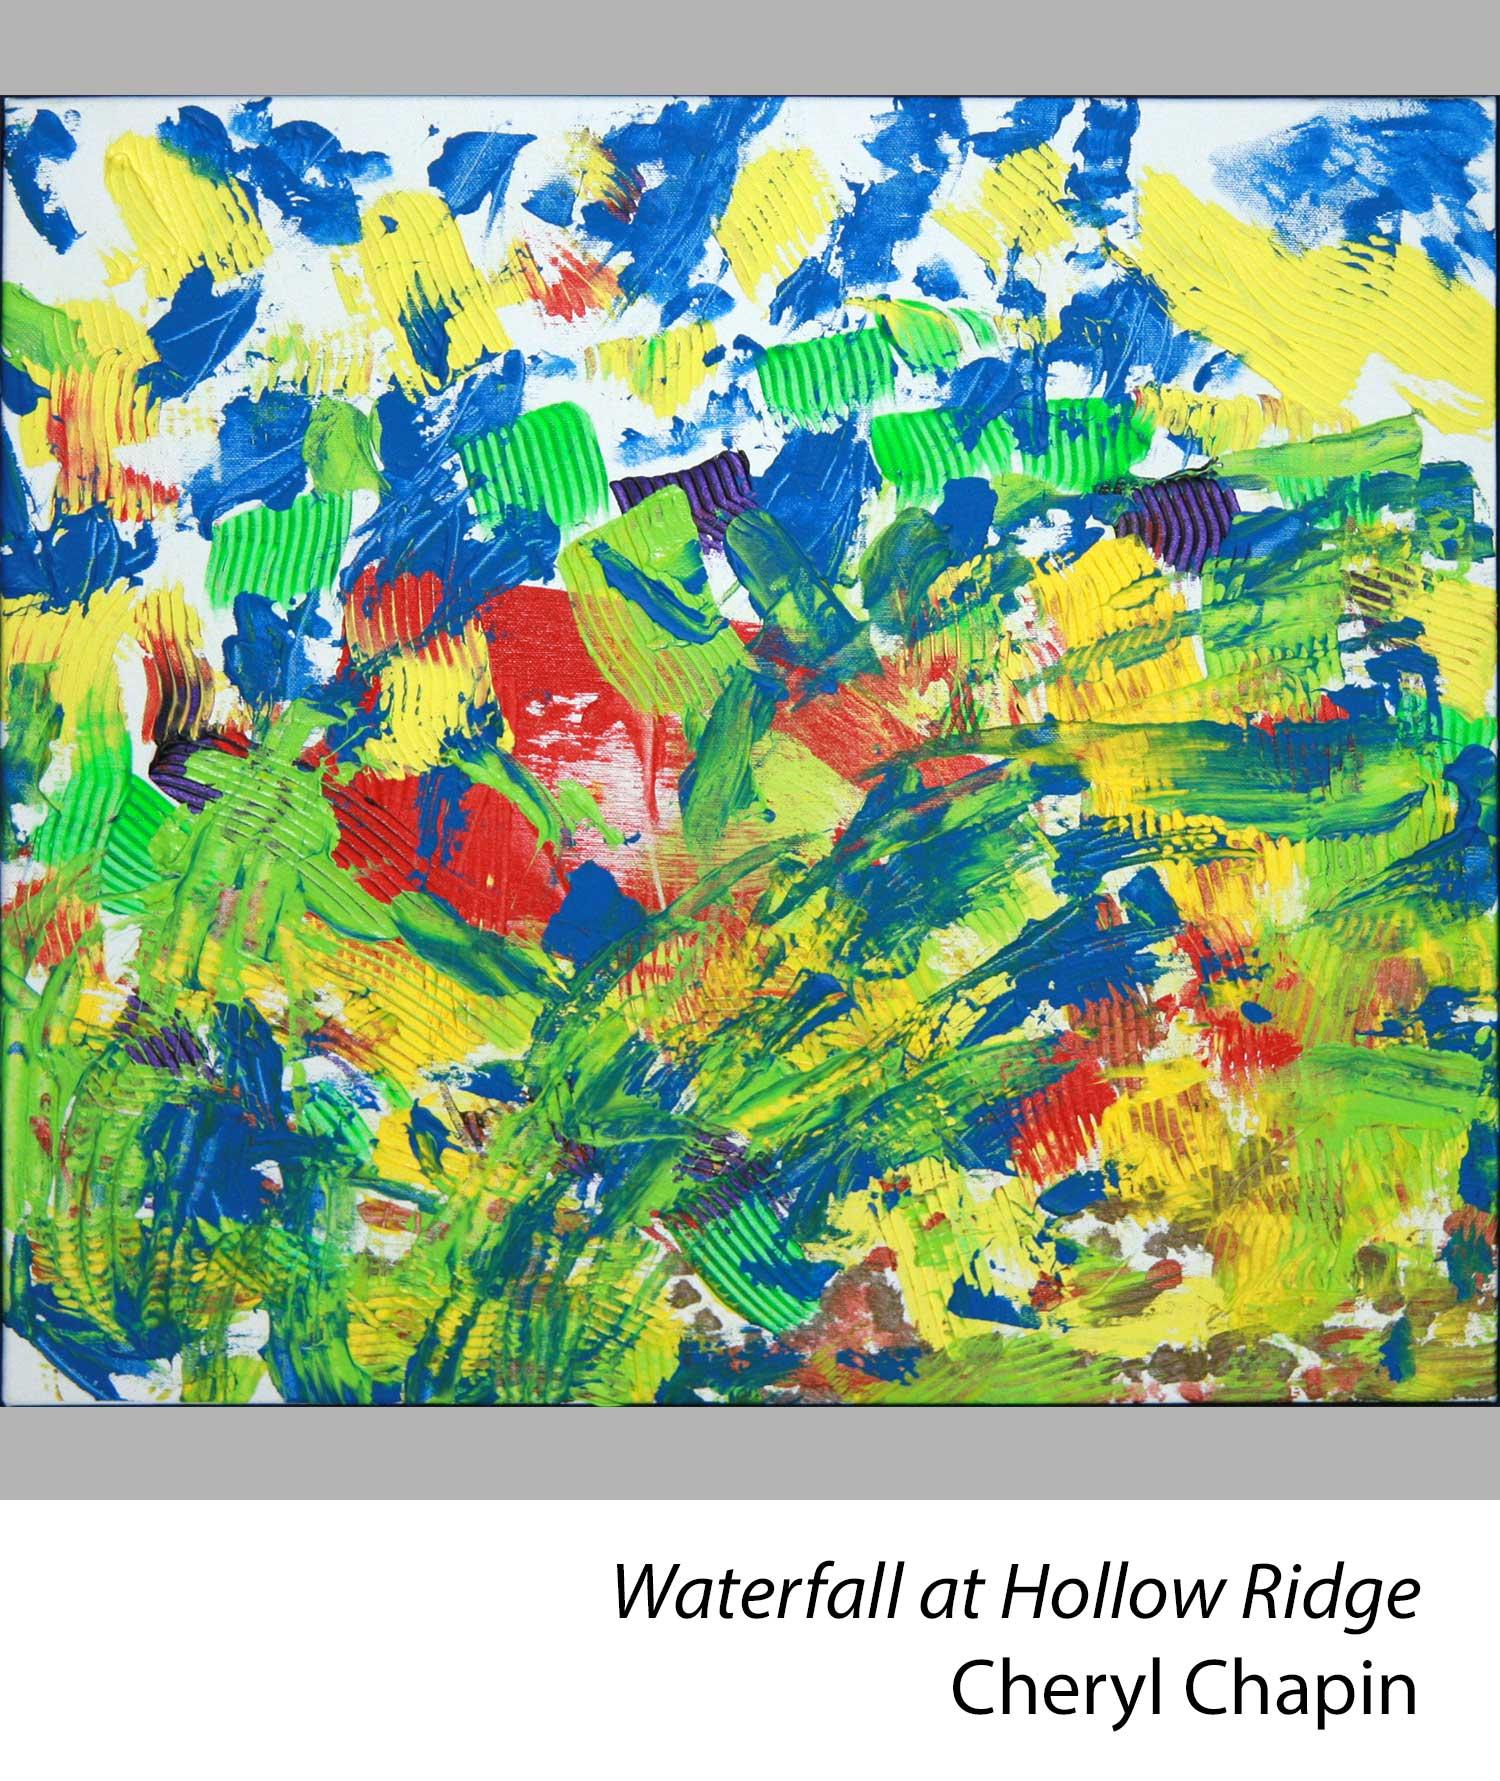 Waterfall at Hollow Ridge by Cheryl Chapin